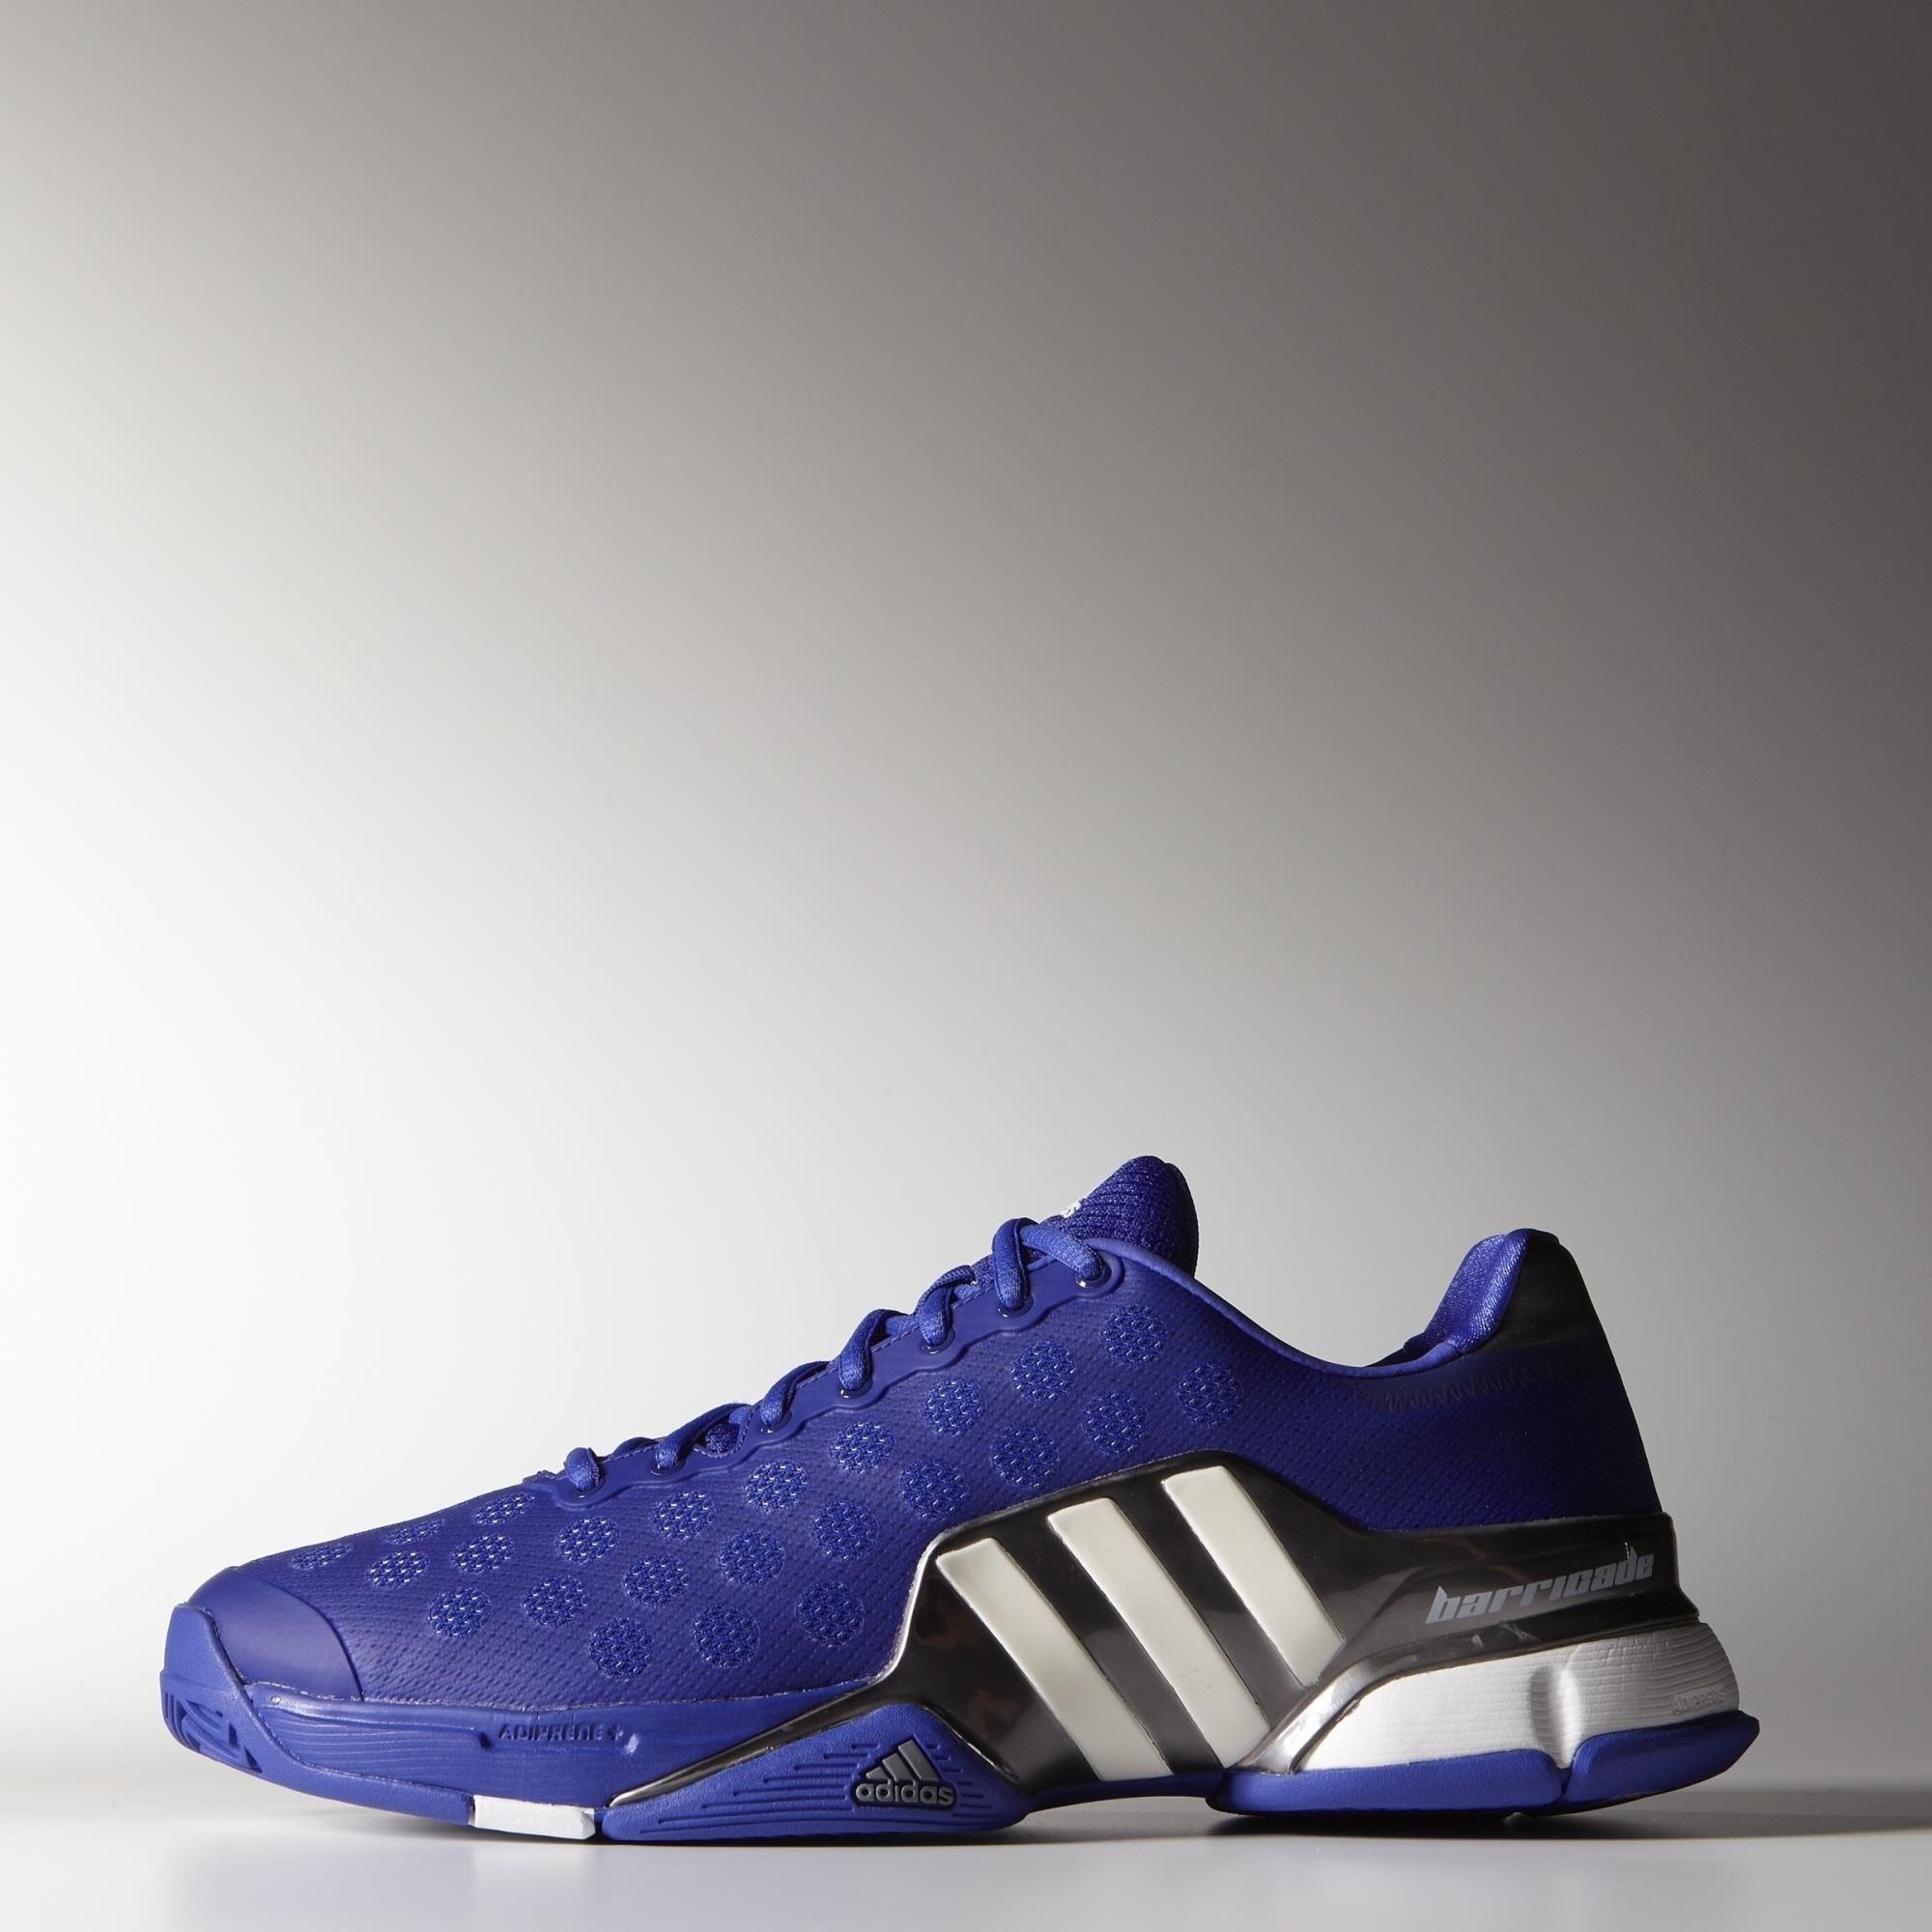 Adidas Barricade 9 All Court Shoes Adidas Us Adidas Shoes Mens Adidas Barricade Adidas